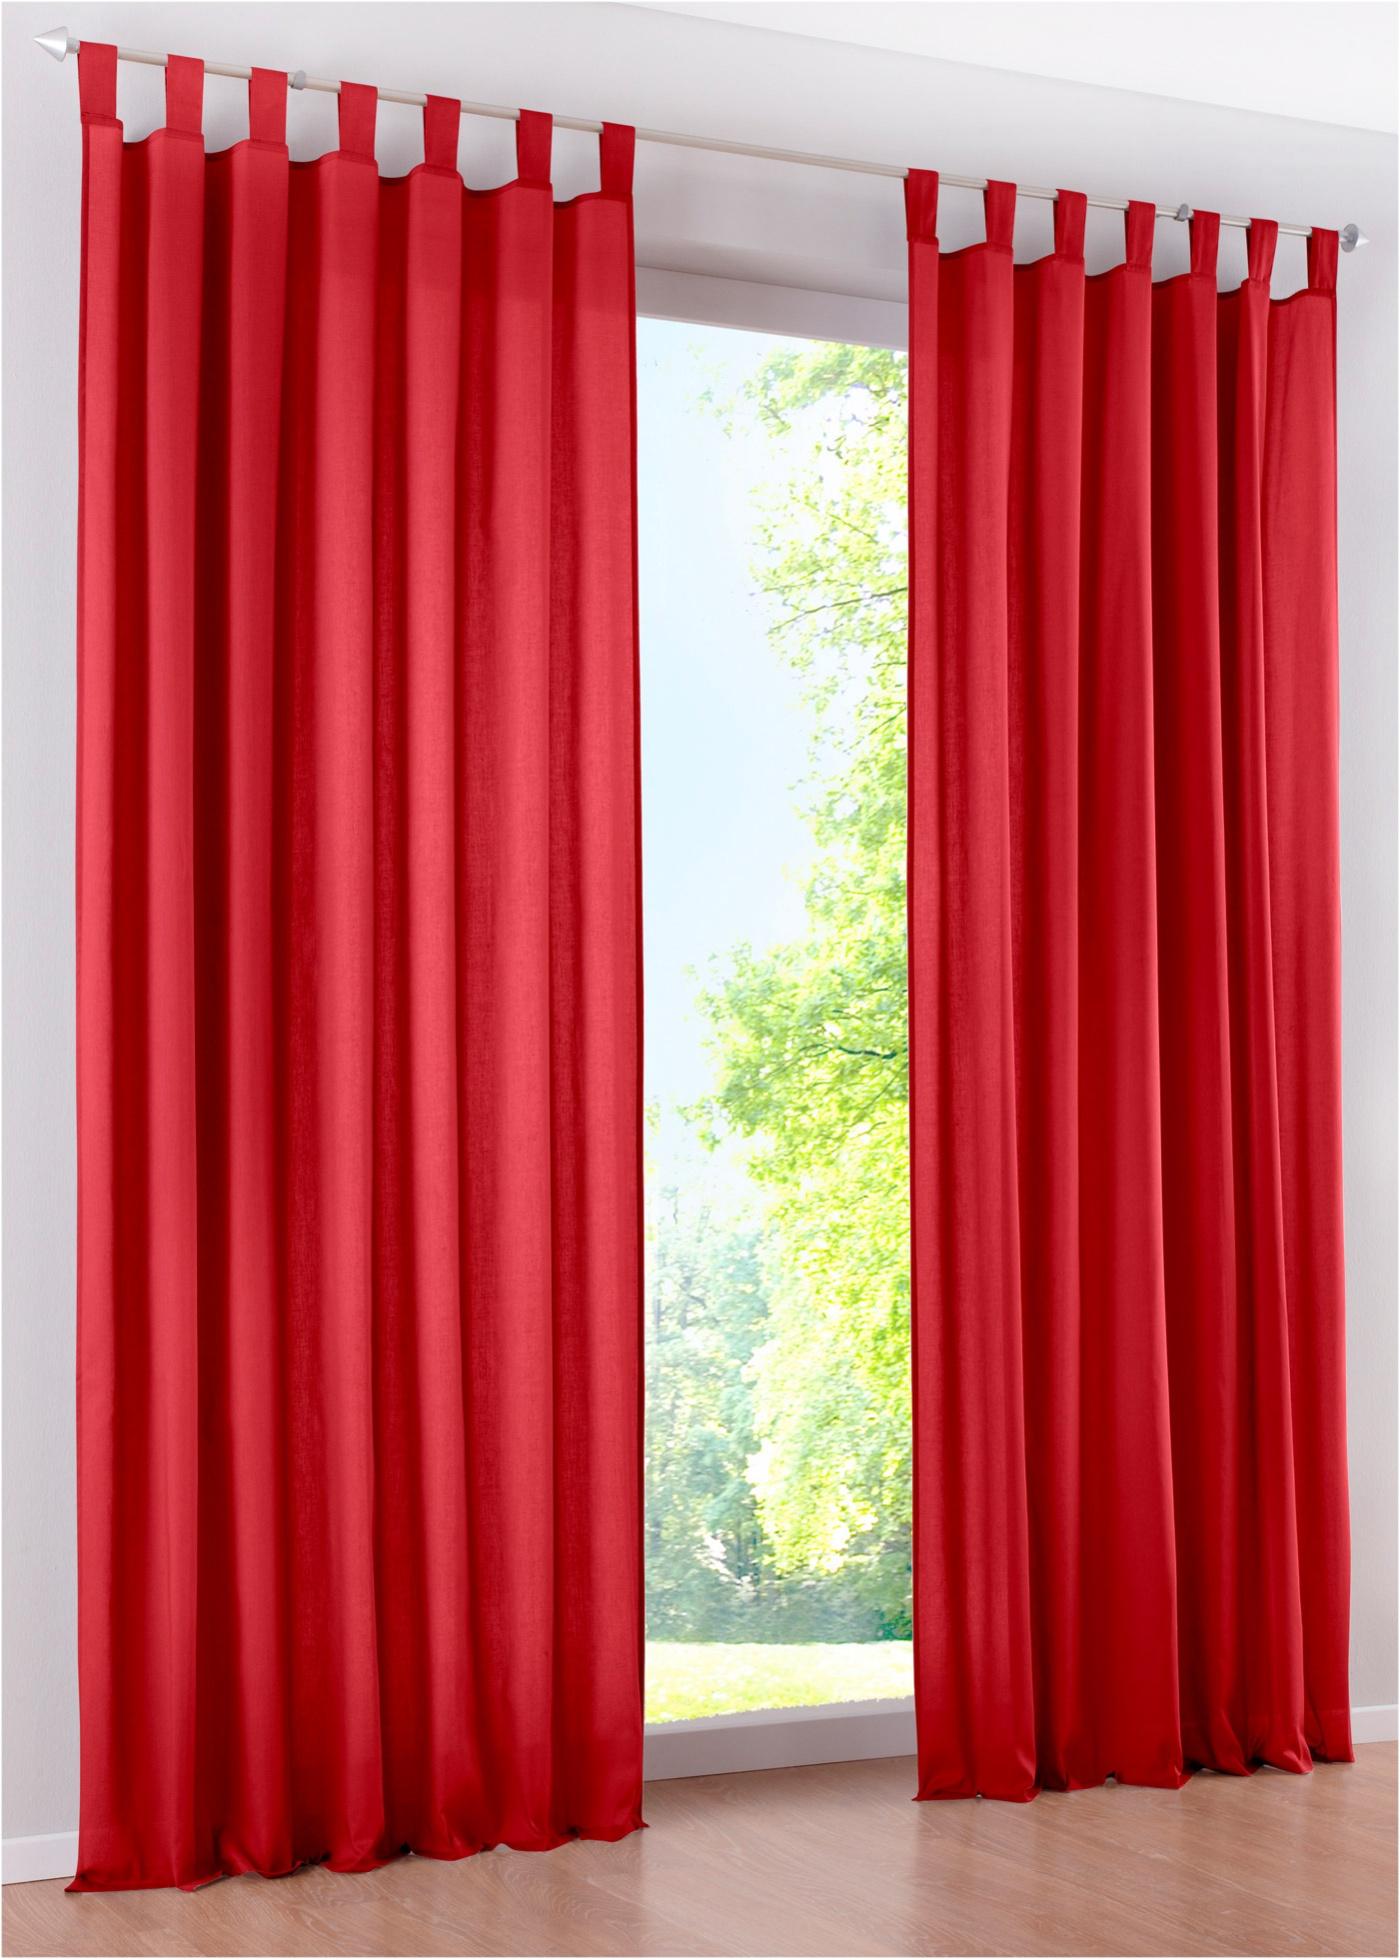 gardinen deko bonprix vorh nge raffrollo gardinen. Black Bedroom Furniture Sets. Home Design Ideas